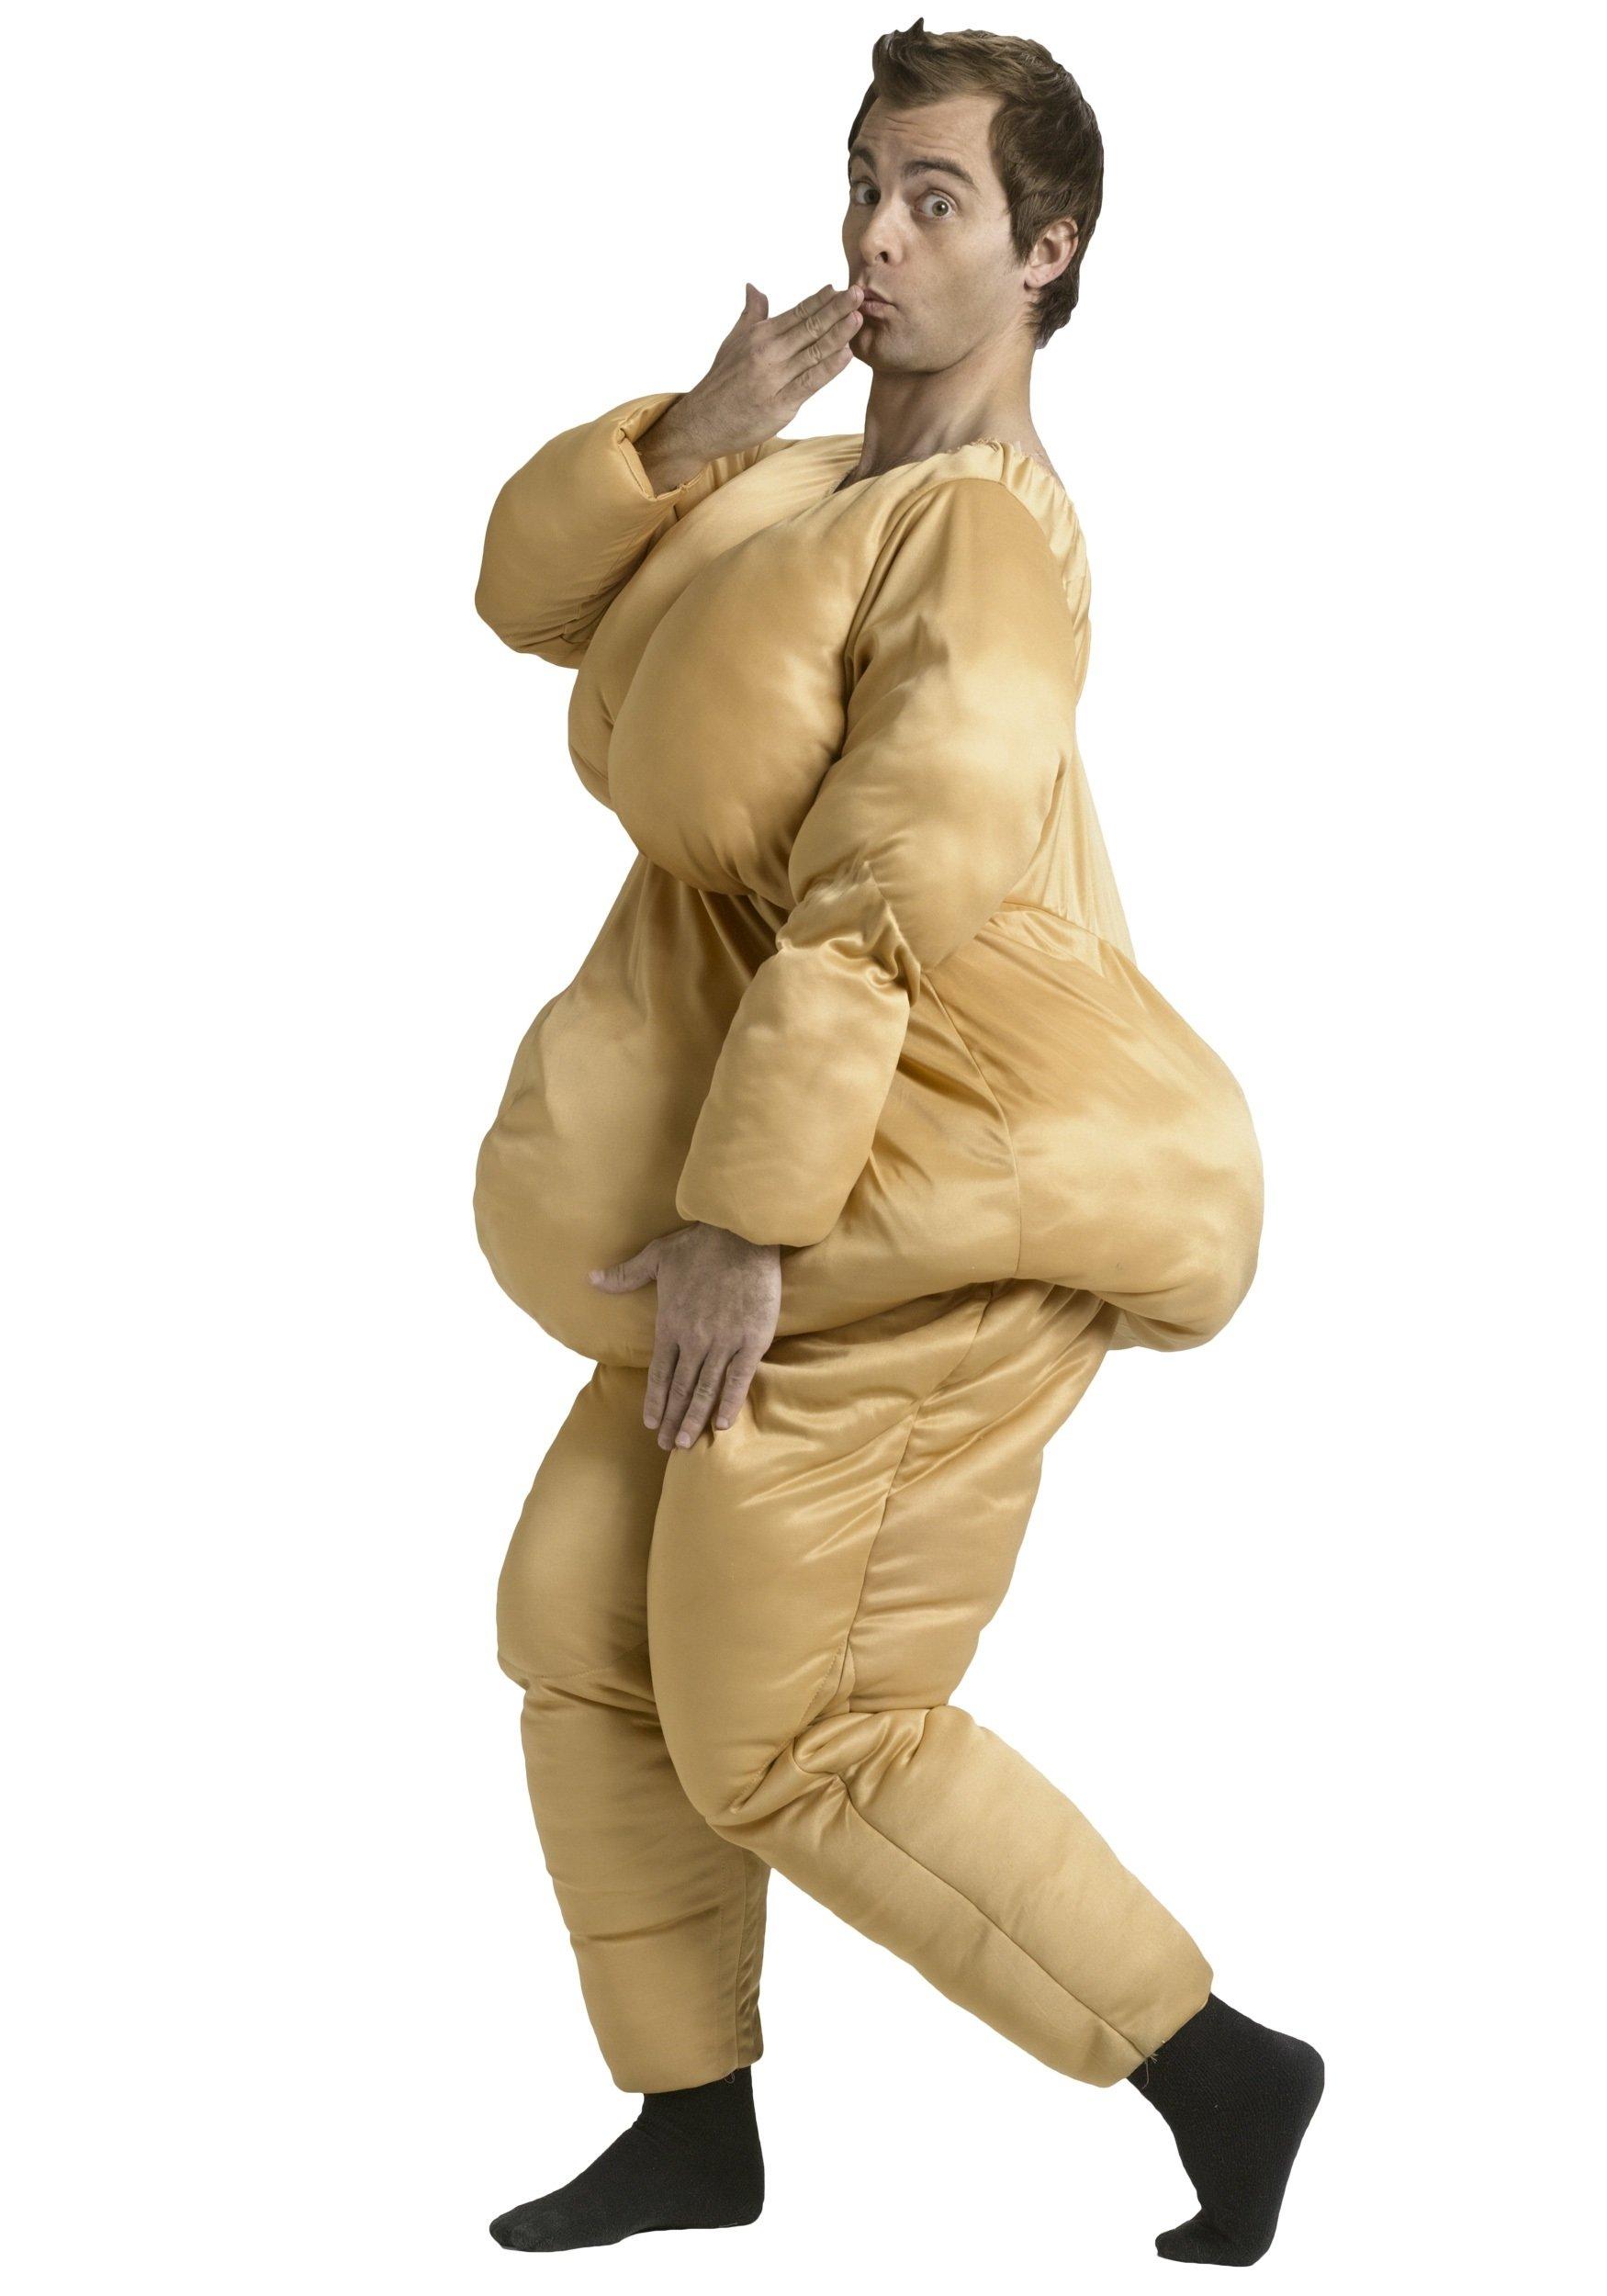 10 Attractive Halloween Costume Ideas For Big Men adult fat suit costume 2021